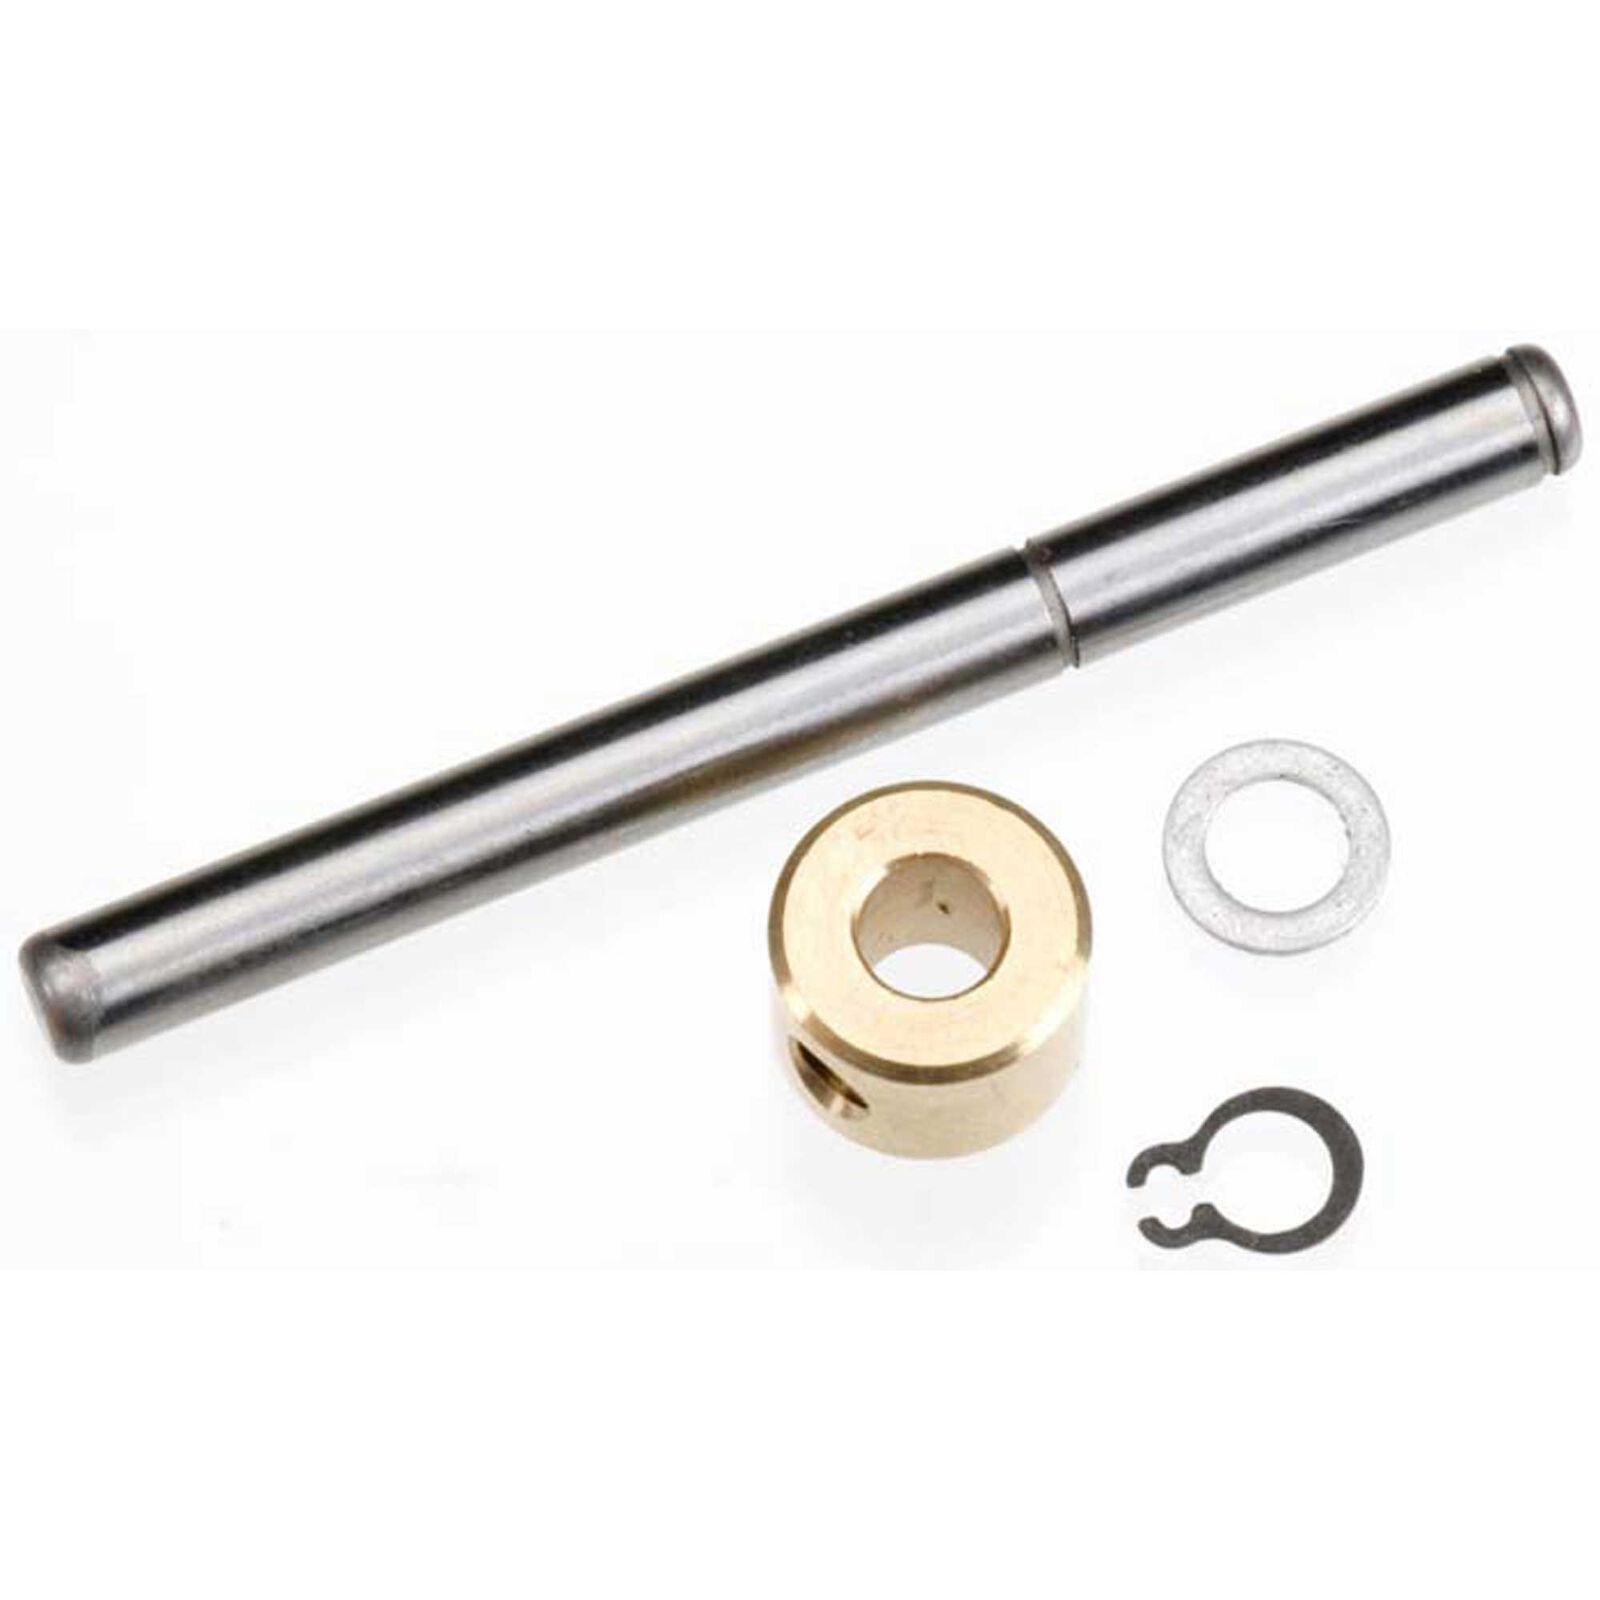 Rimfire 35-30-xx Replacement Shaft Kit